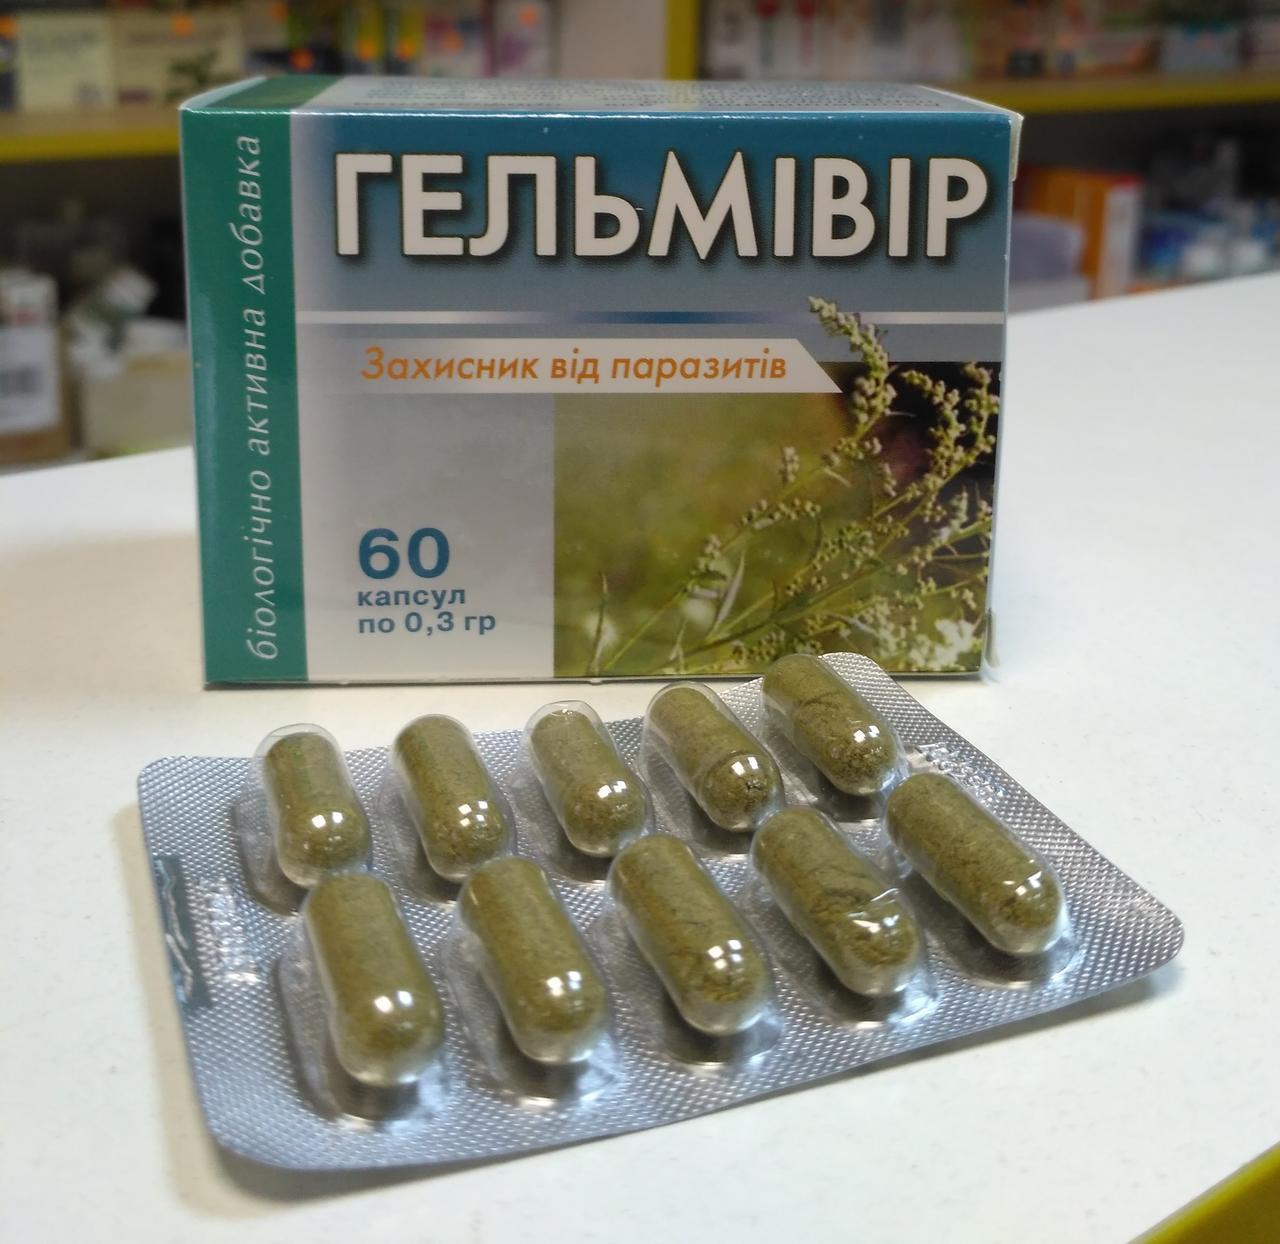 Гельмивир 60 капсул по 0,3 гр